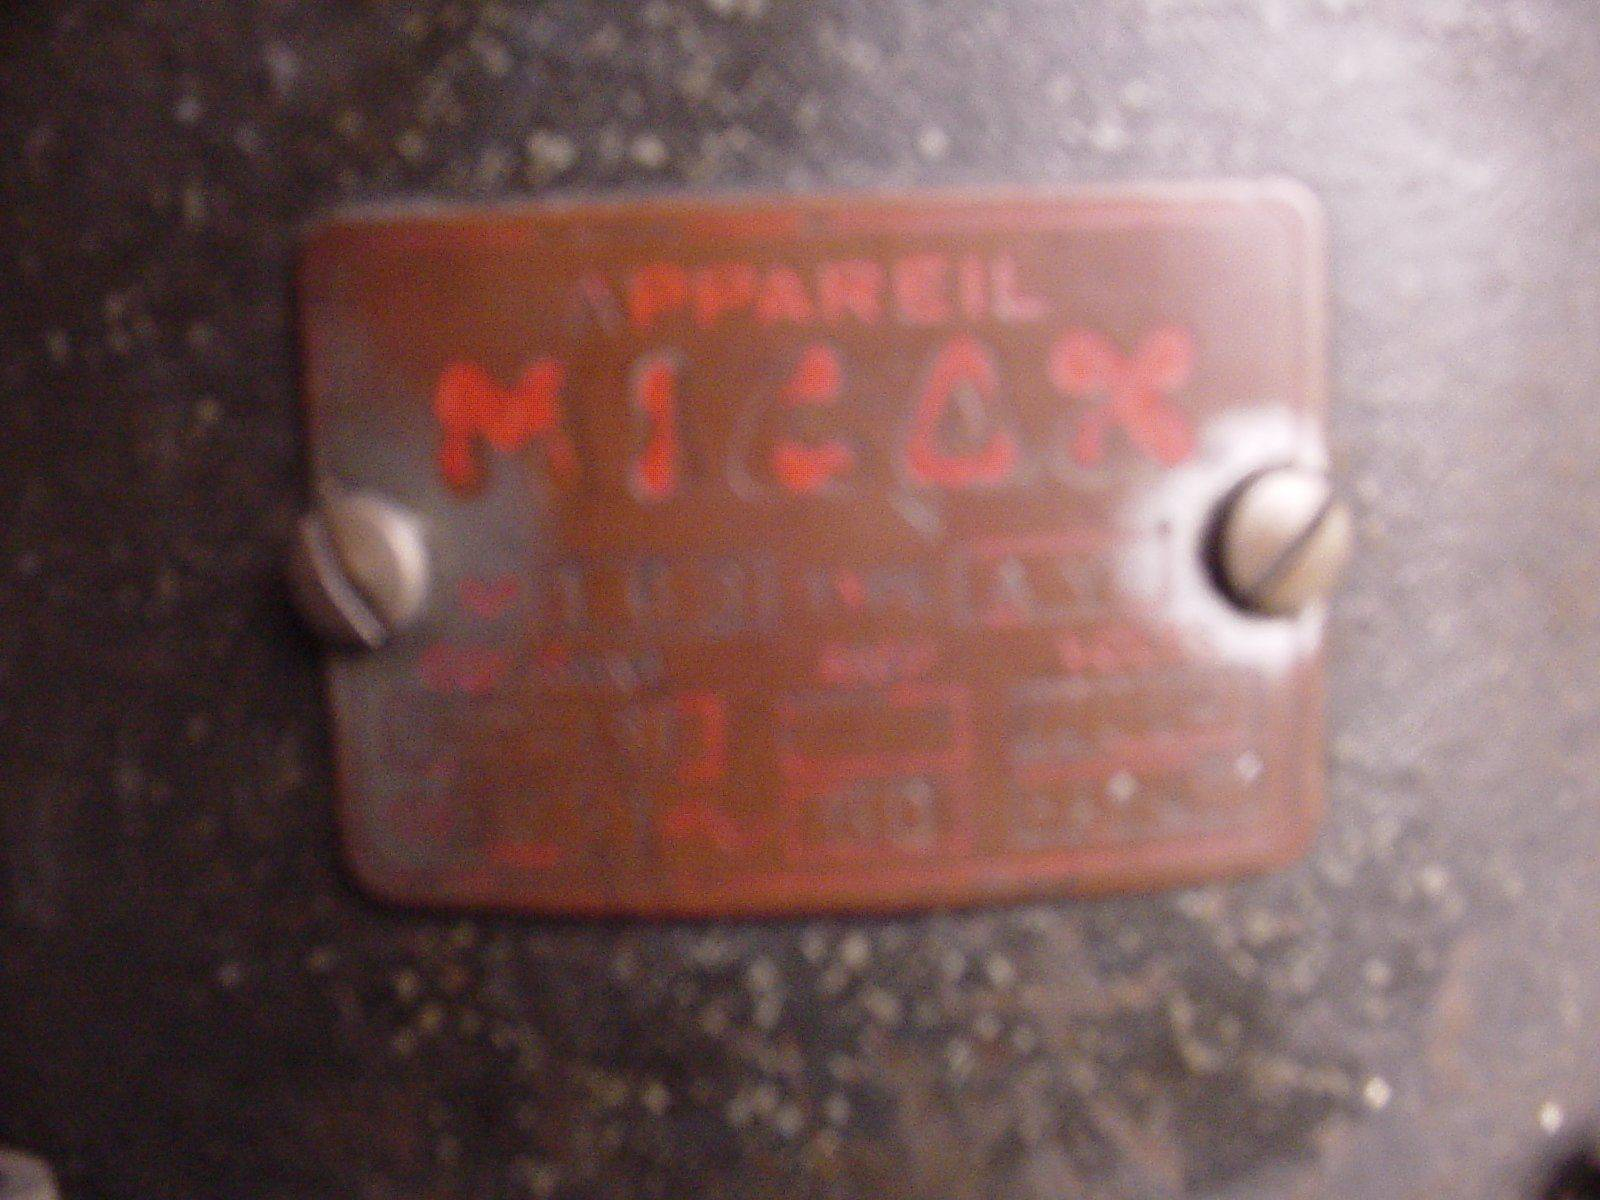 DSC06328.JPG